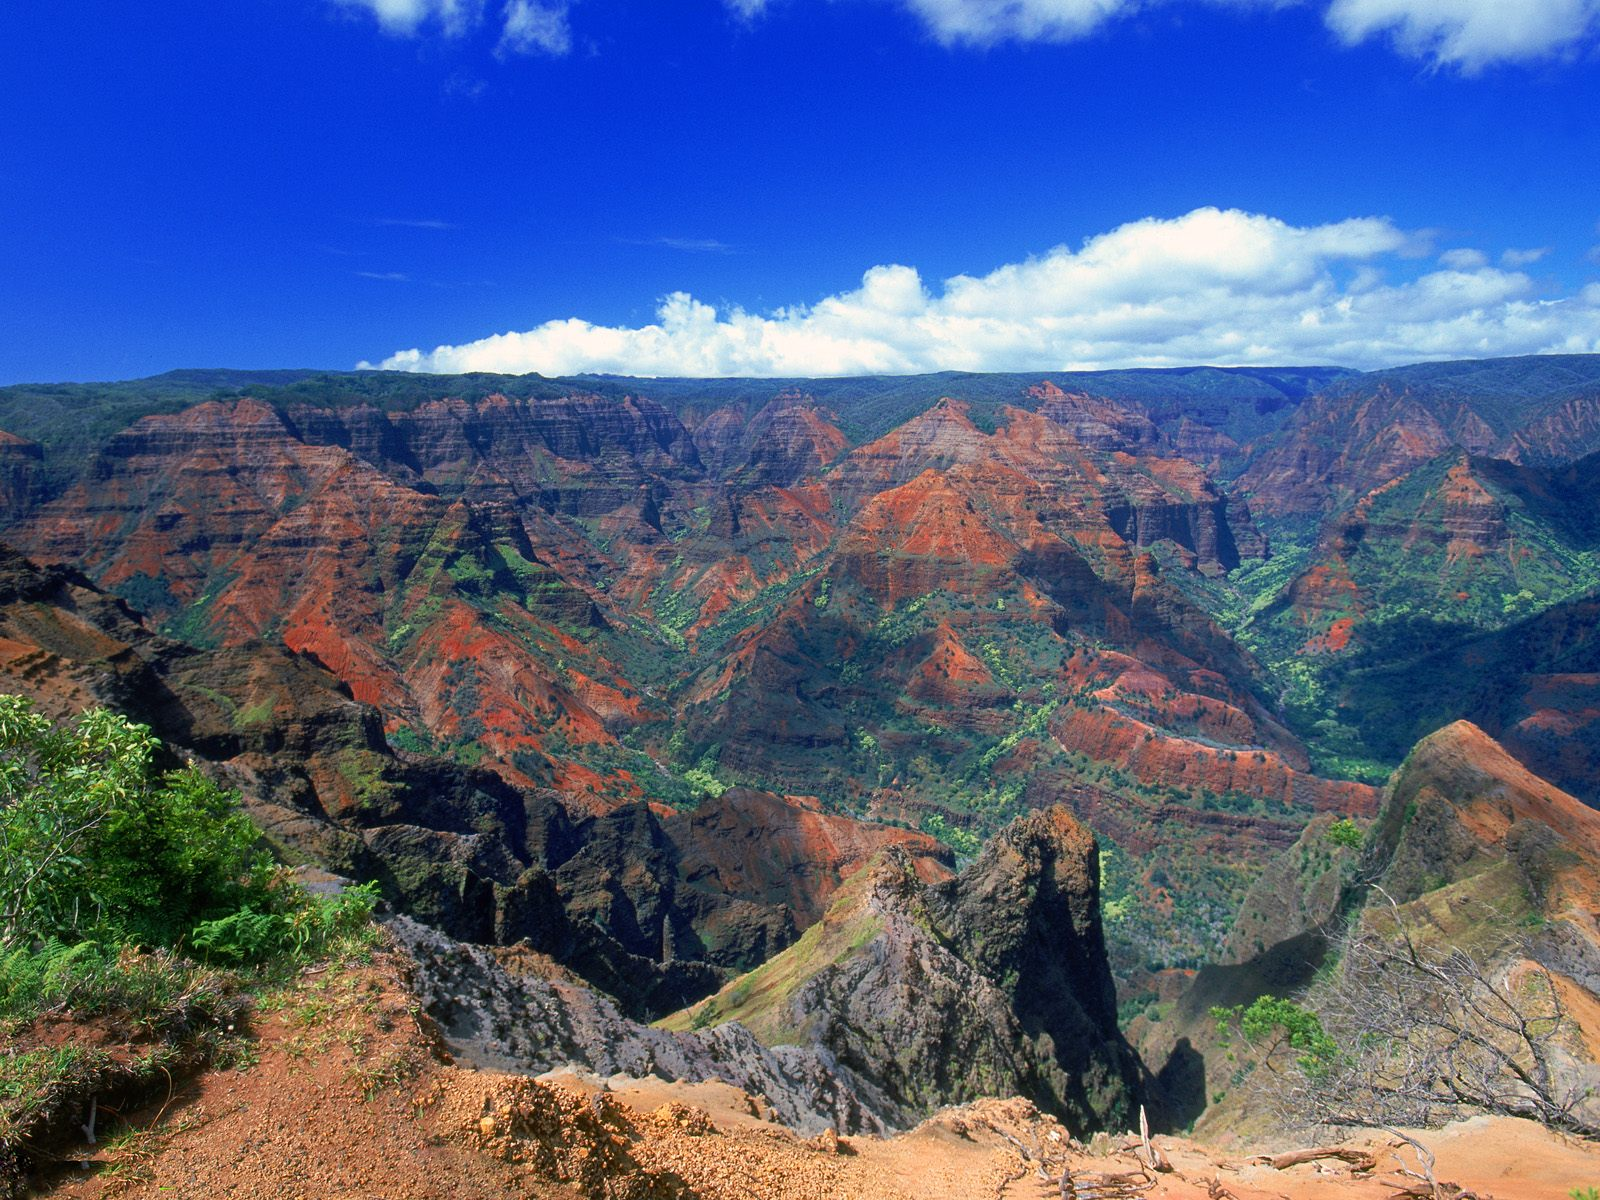 Kauai Hawaii: Sapphire Princess Odyssey 10/22/11